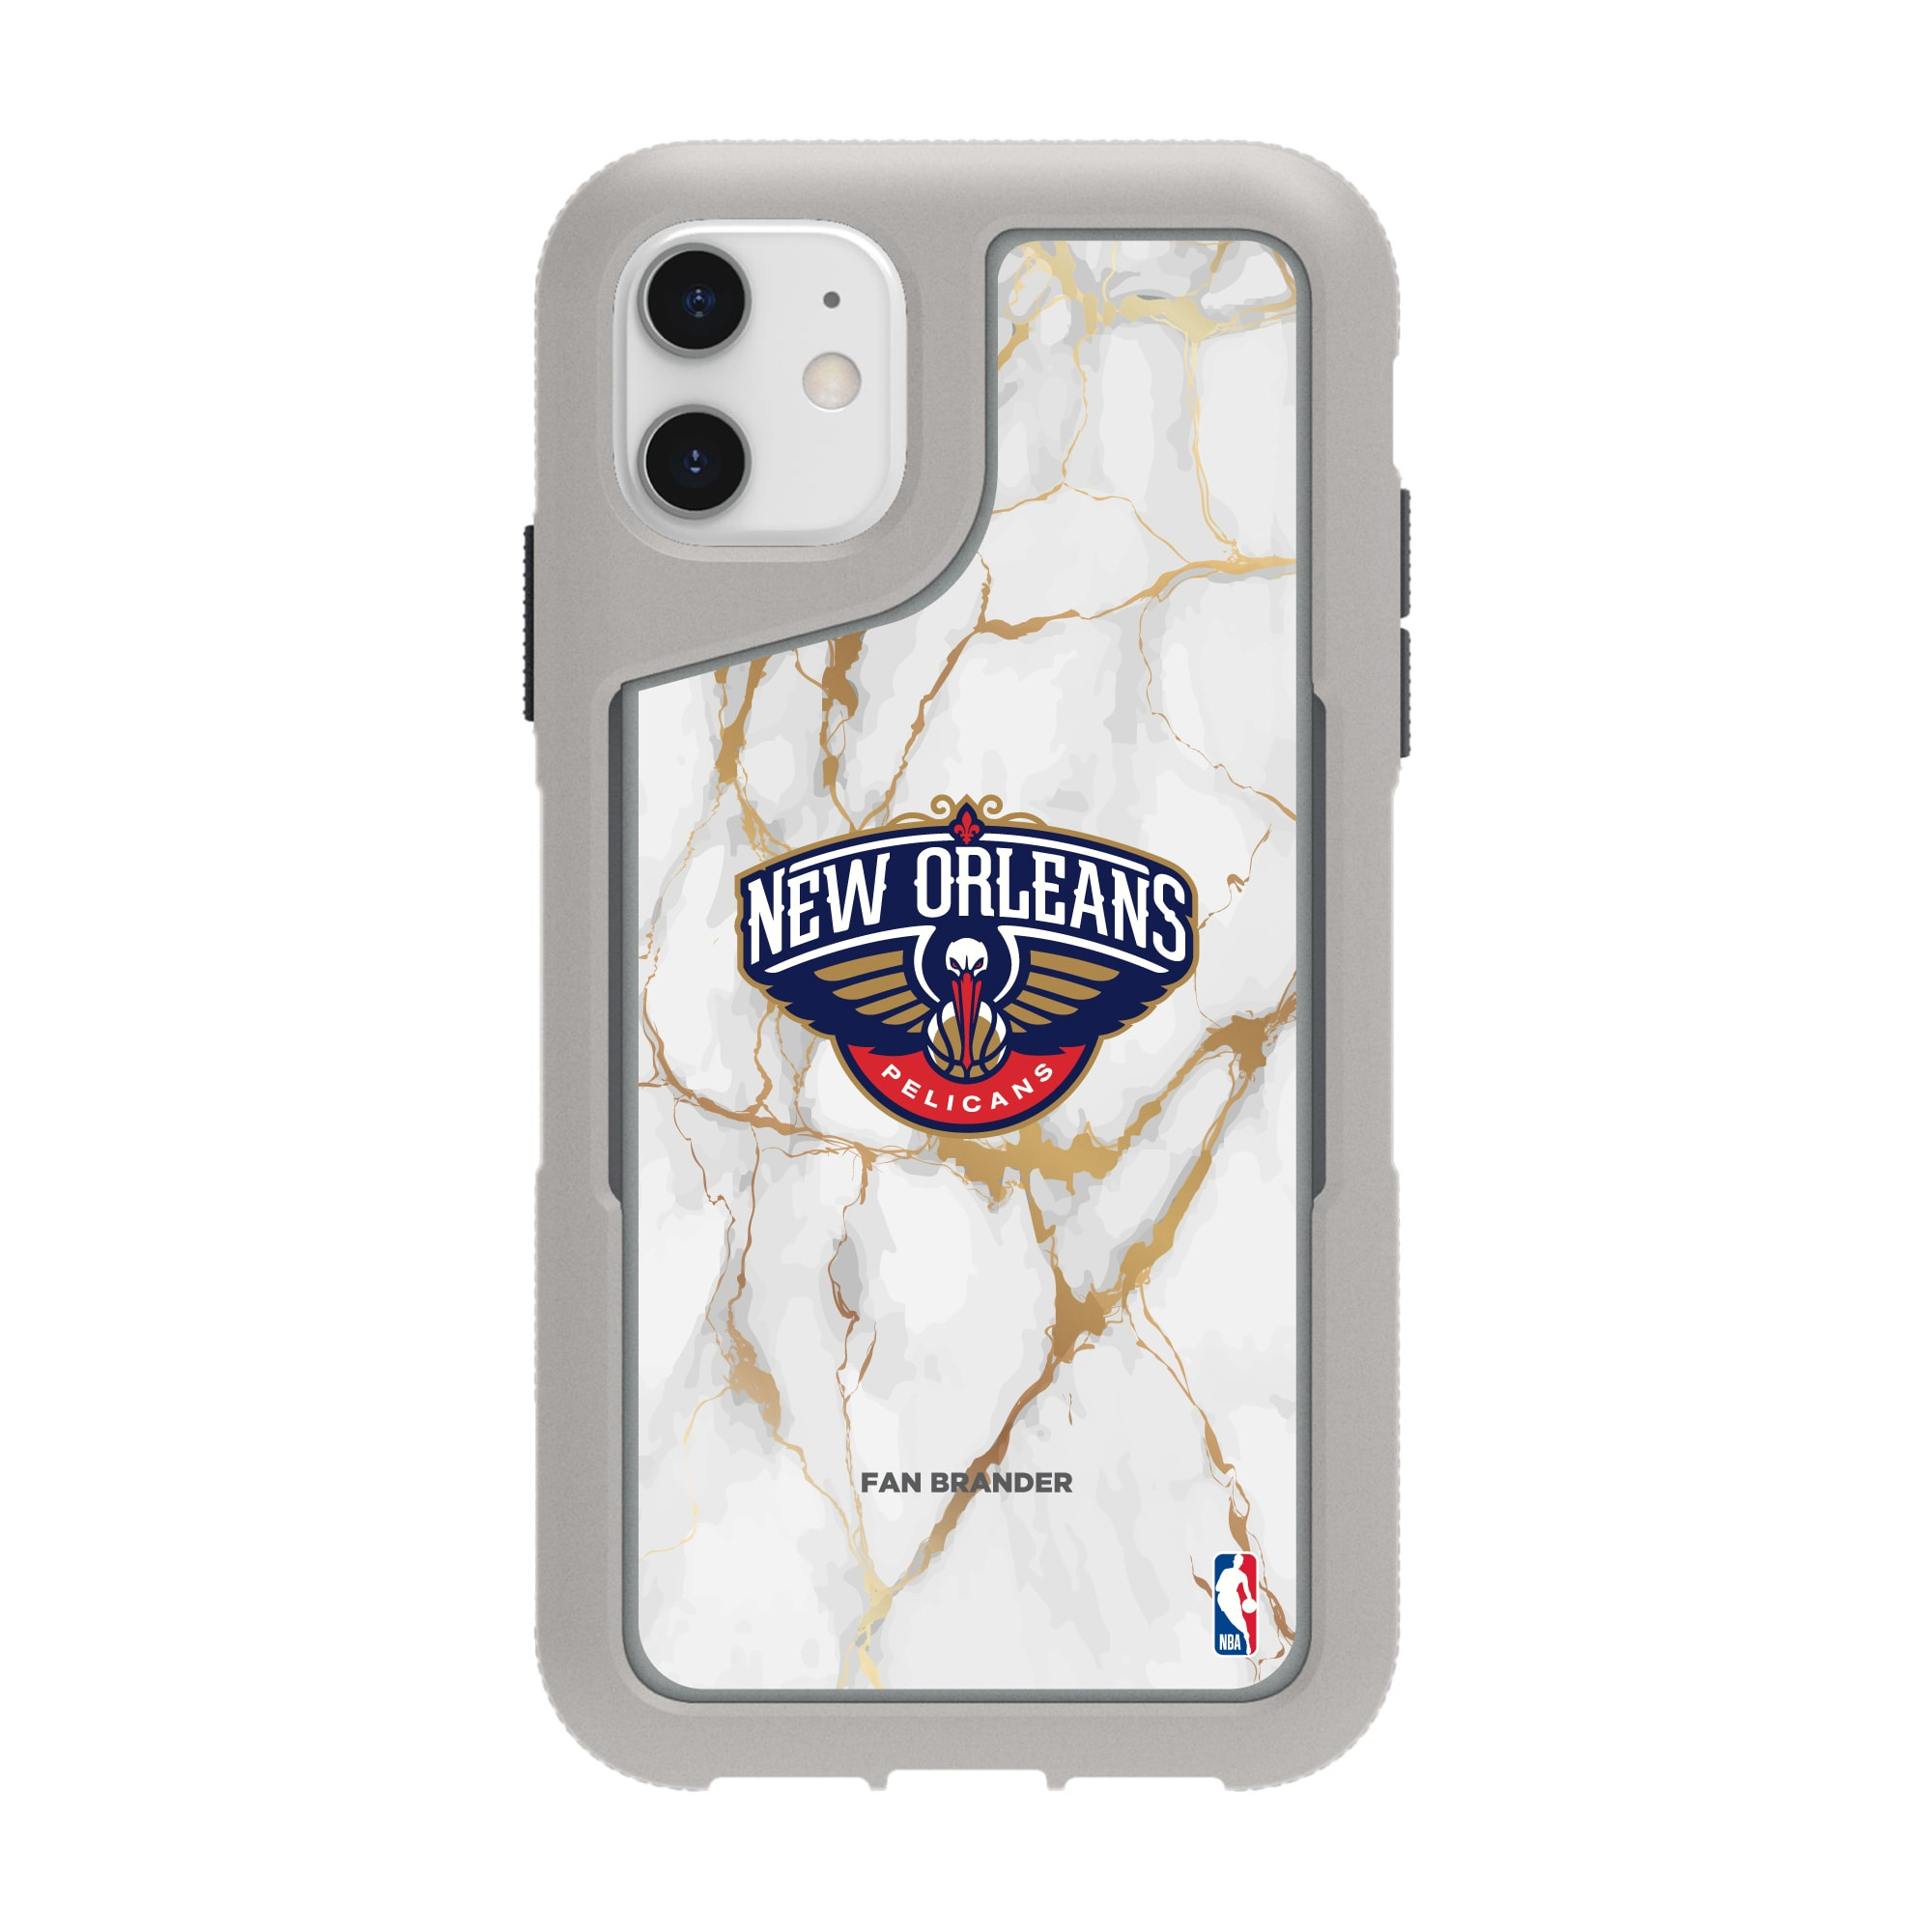 New Orleans Pelicans Griffin Survivor Endurance Marble iPhone Case - Gray